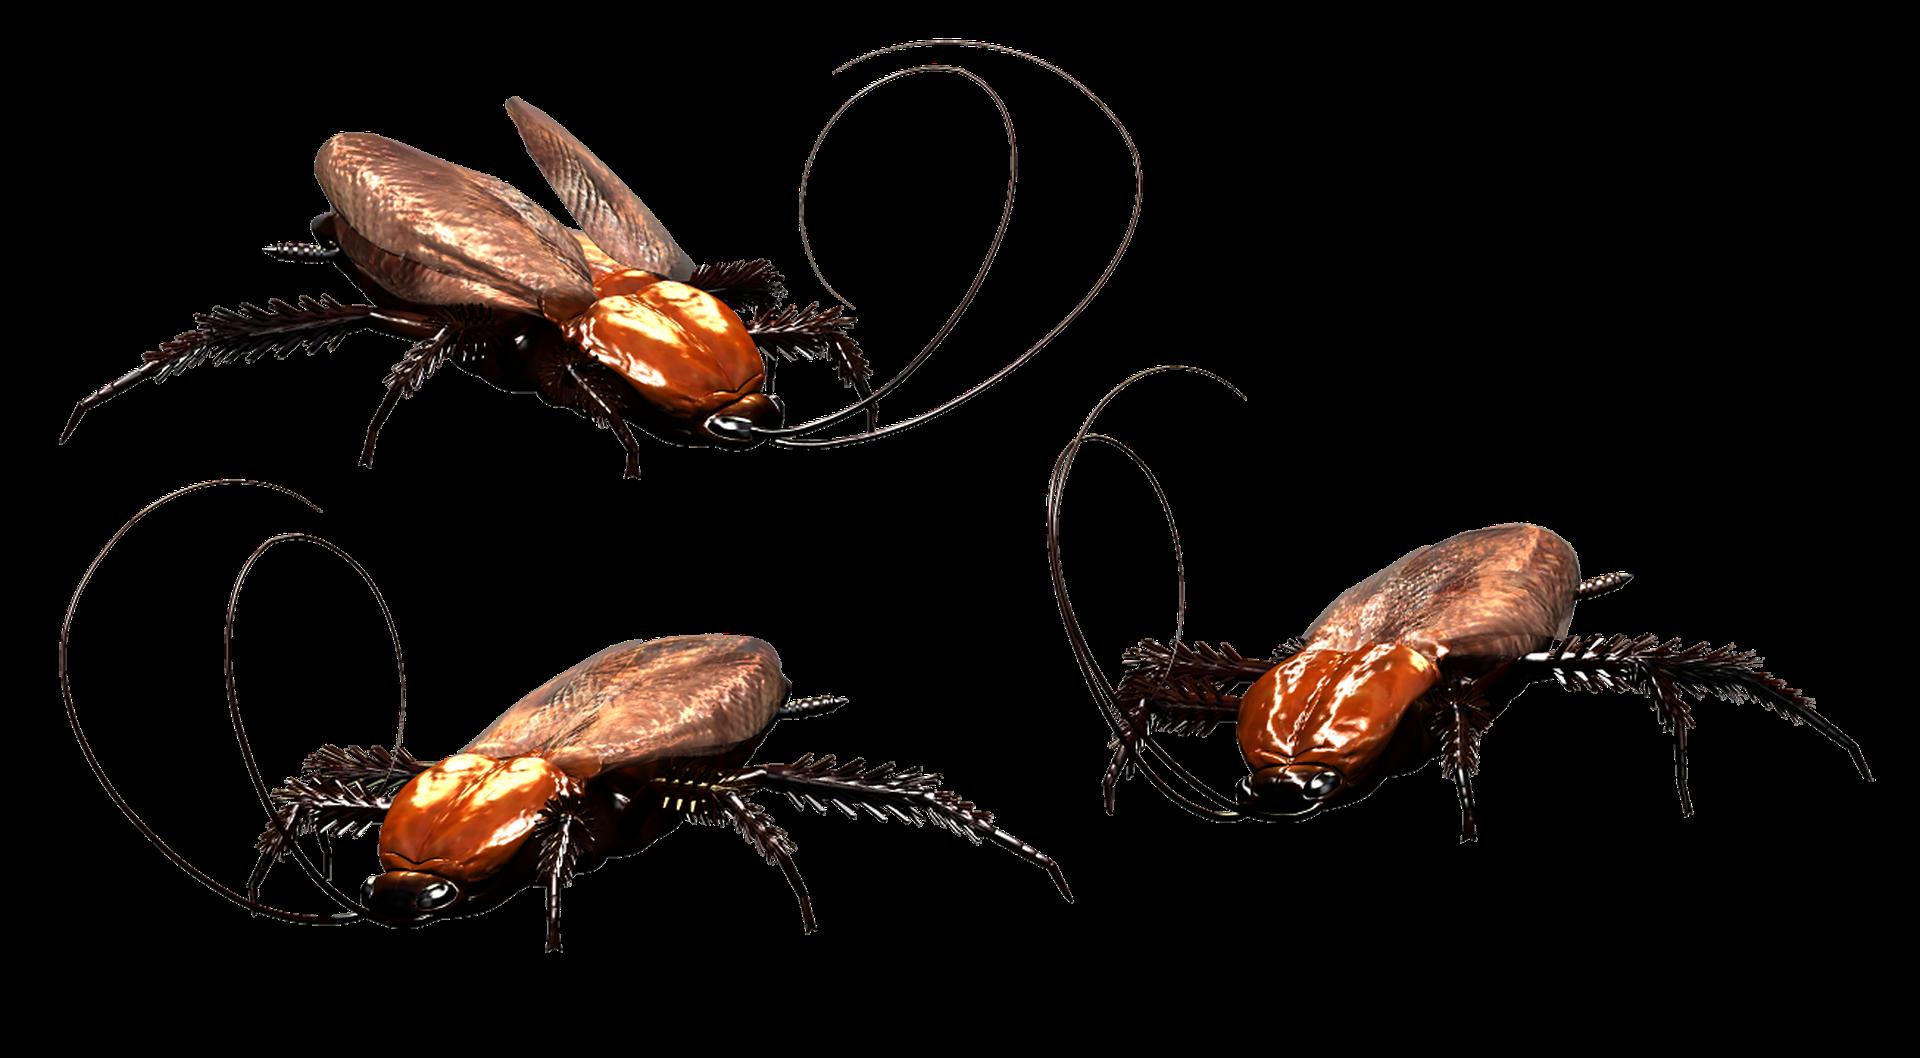 cockroach-3346121_1920